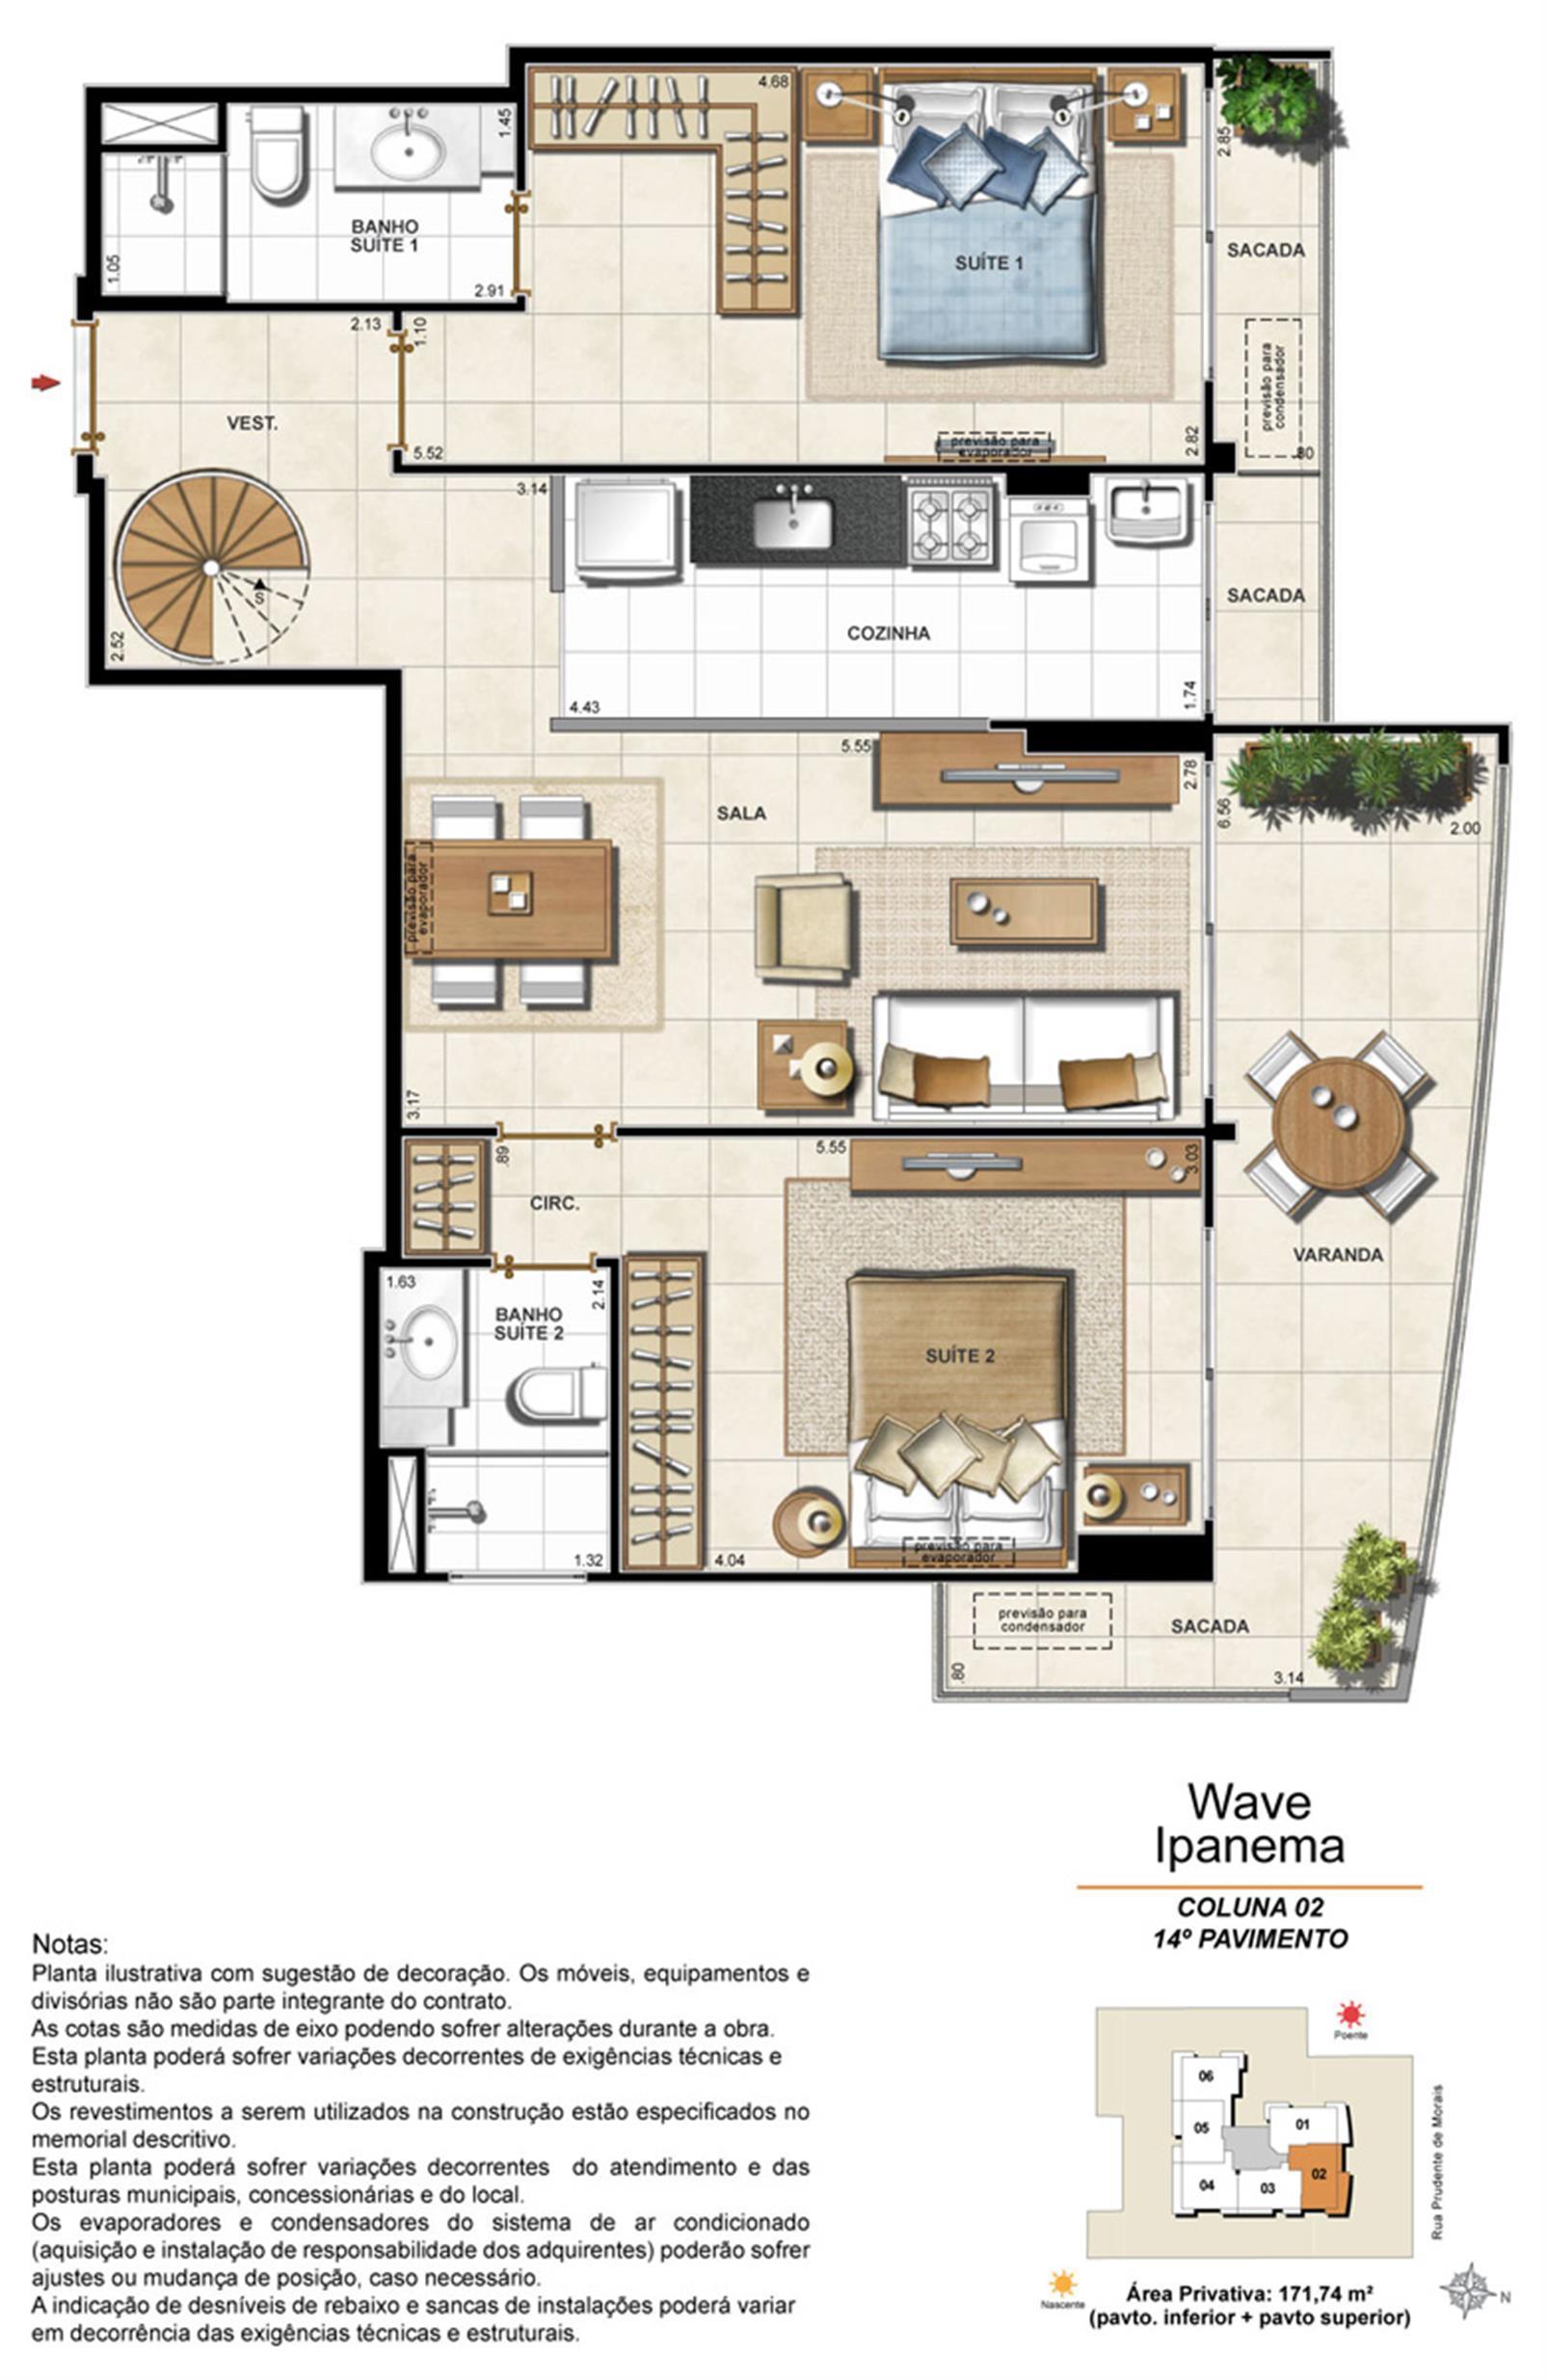 Apartamento Cobertura 1402 | Wave Ipanema – Apartamentoem  Ipanema - Rio de Janeiro - Rio de Janeiro